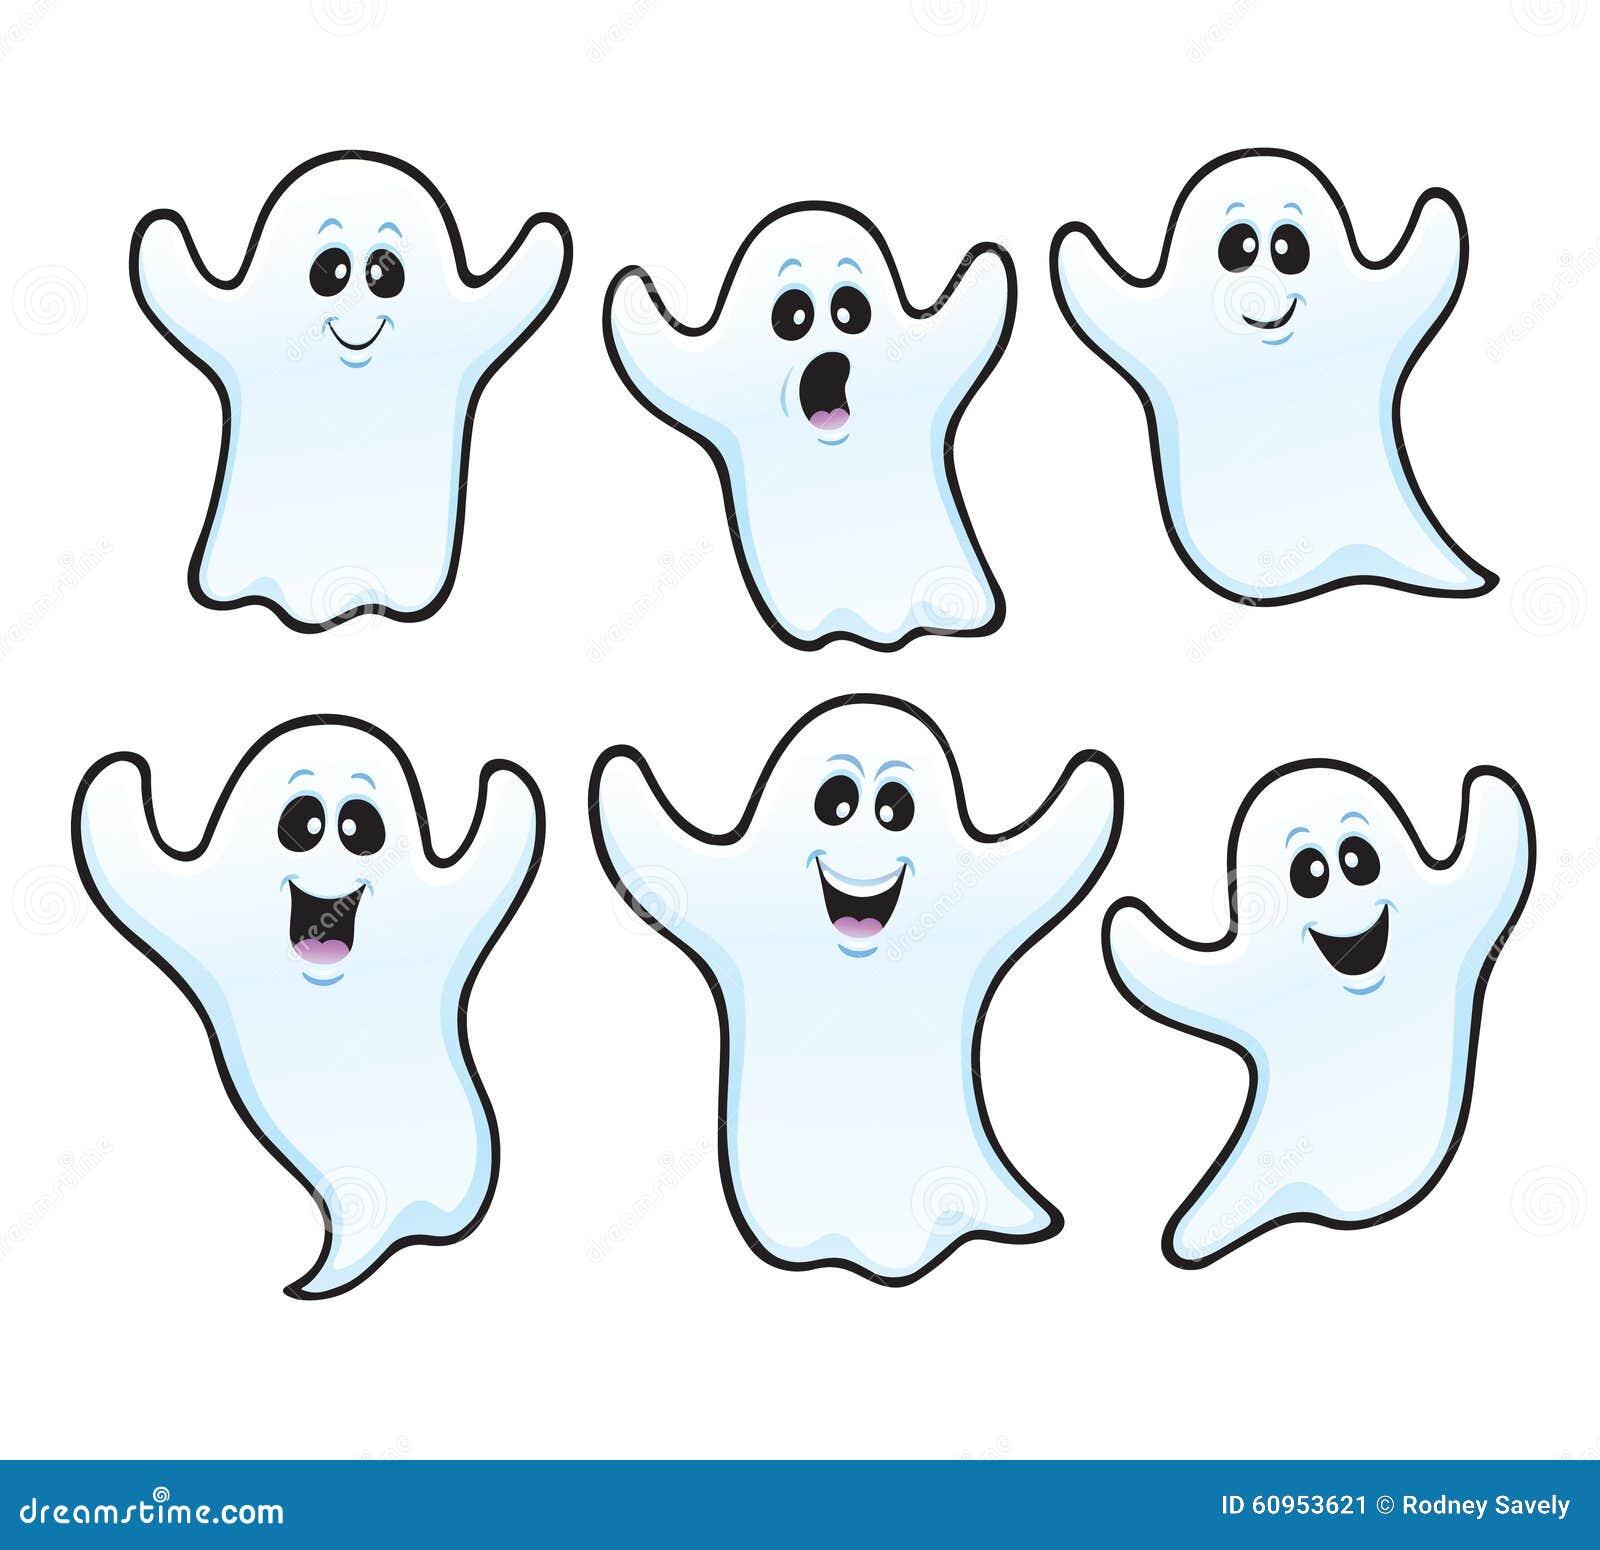 six spooky halloween ghosts stock photo image 60953621 halloween ghost clipart borders halloween ghost clipart free